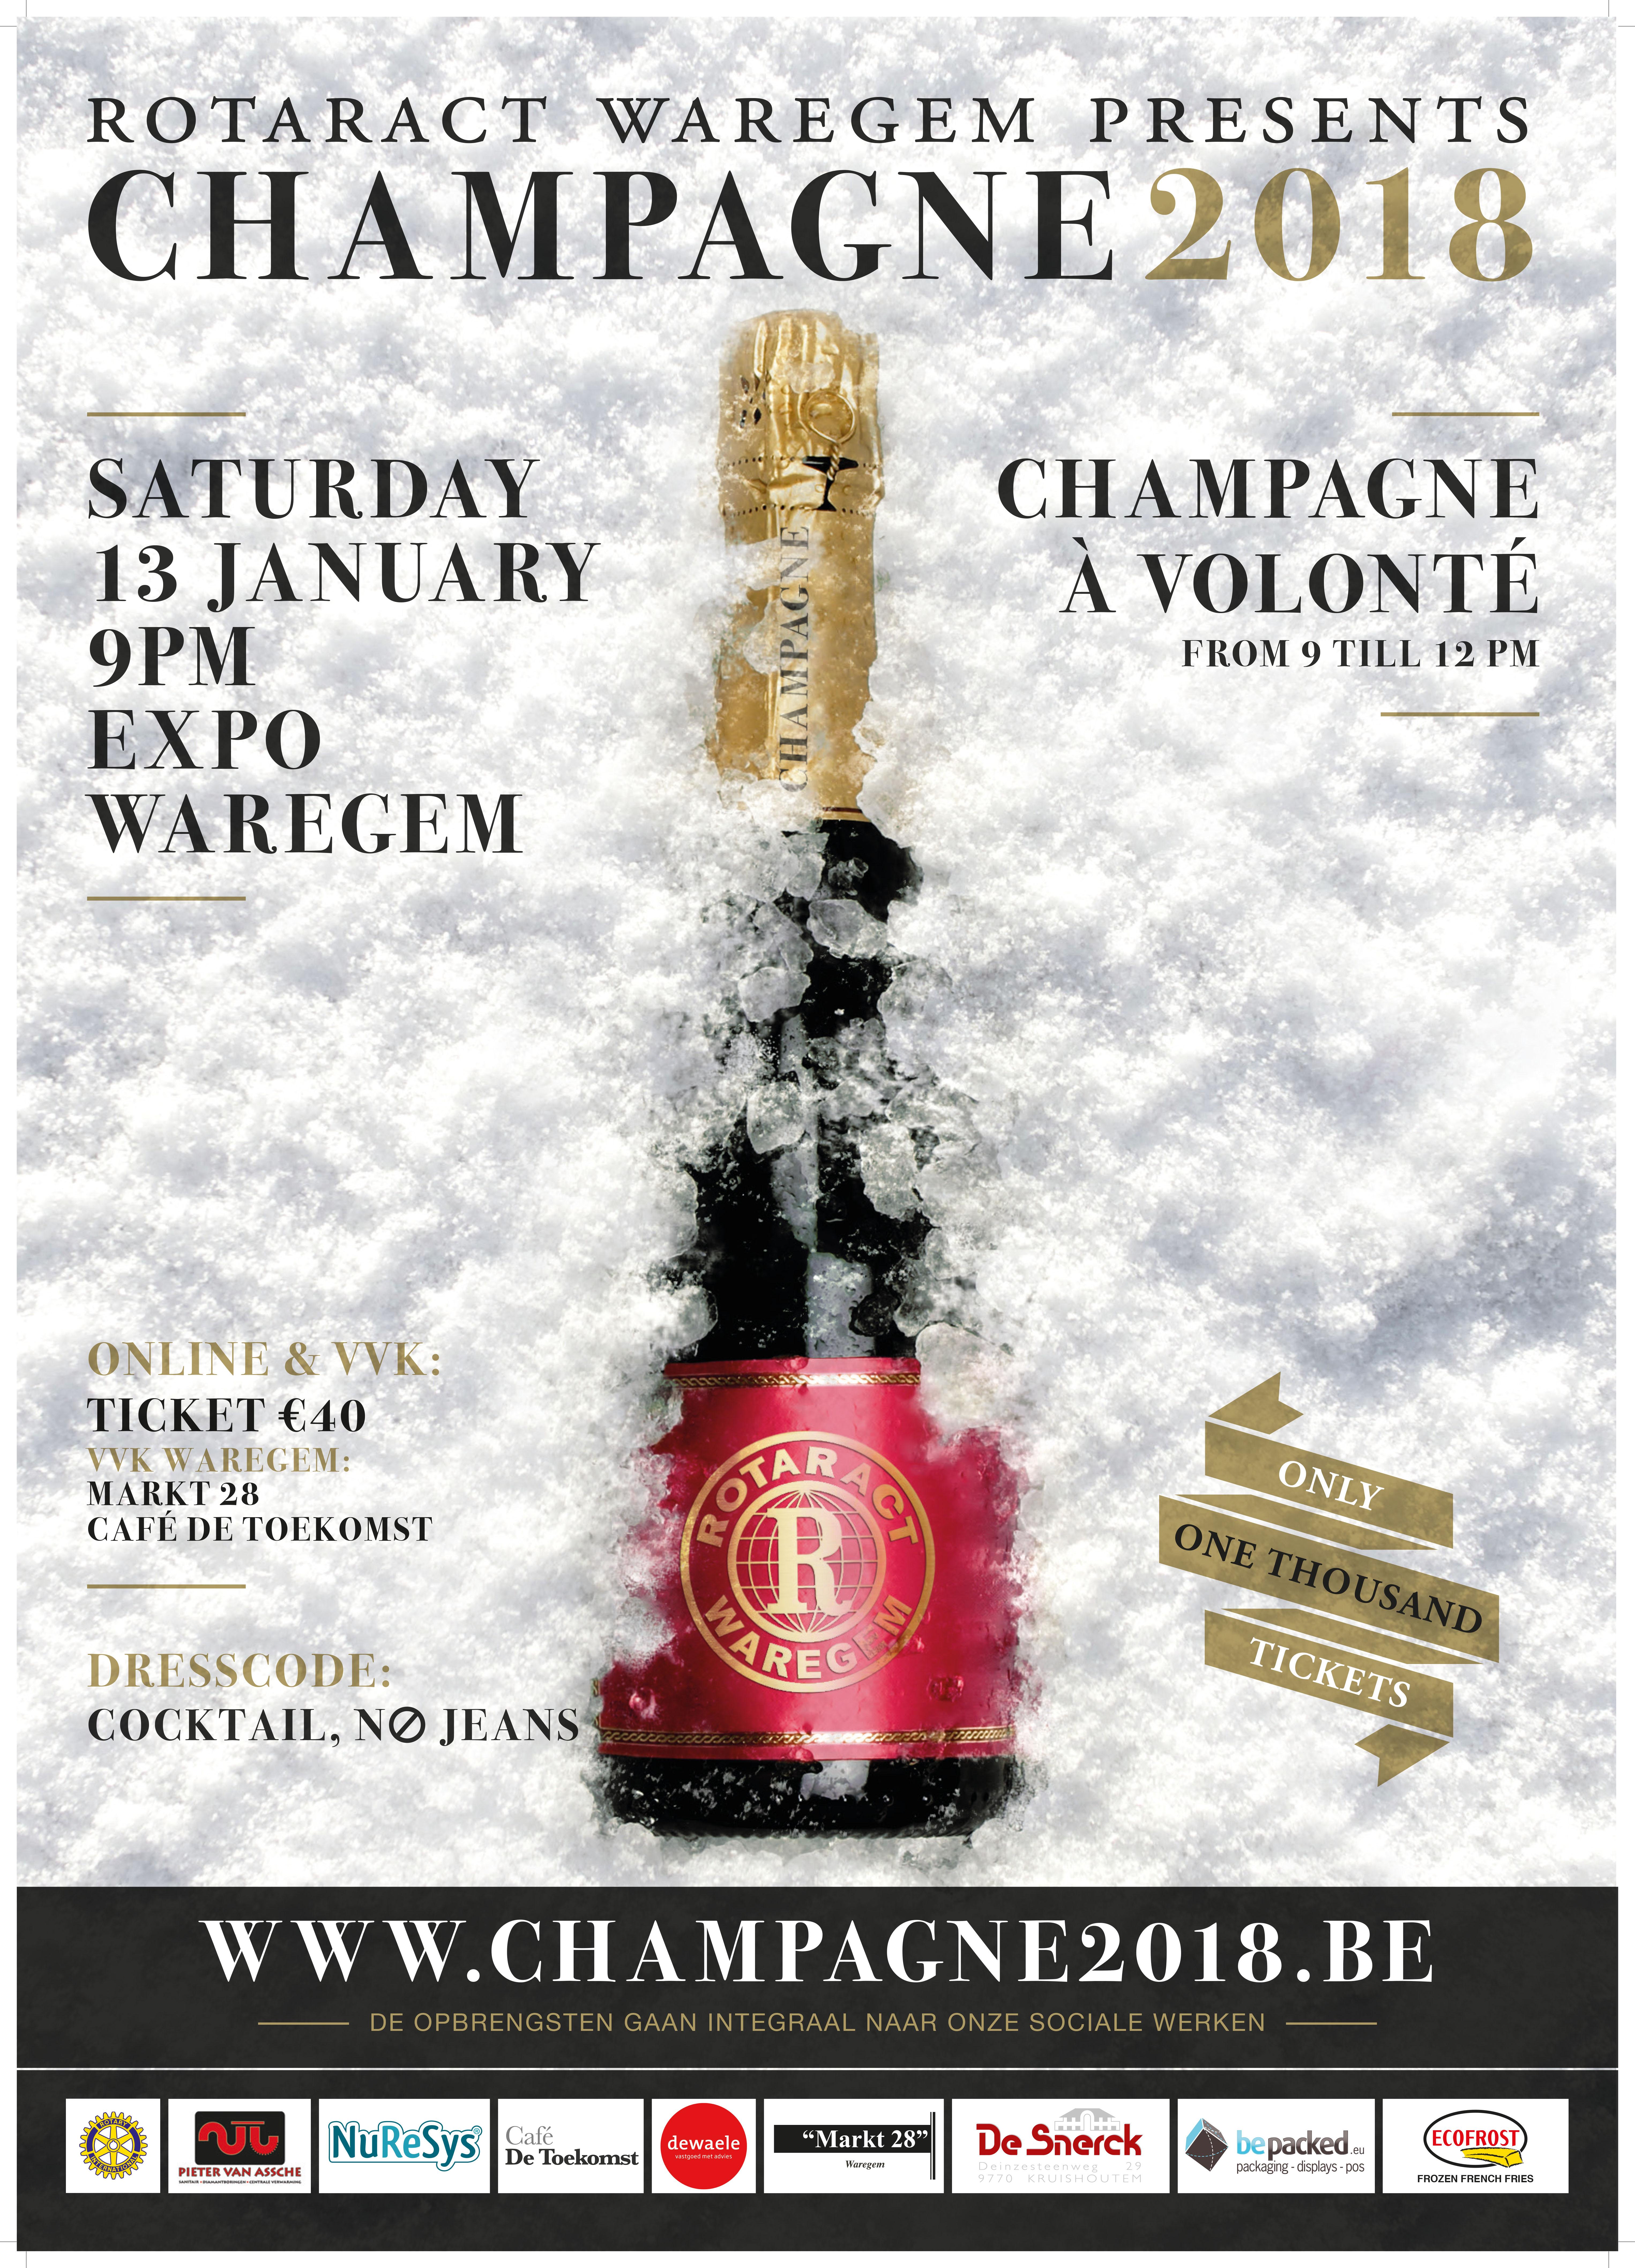 Champagne 2018